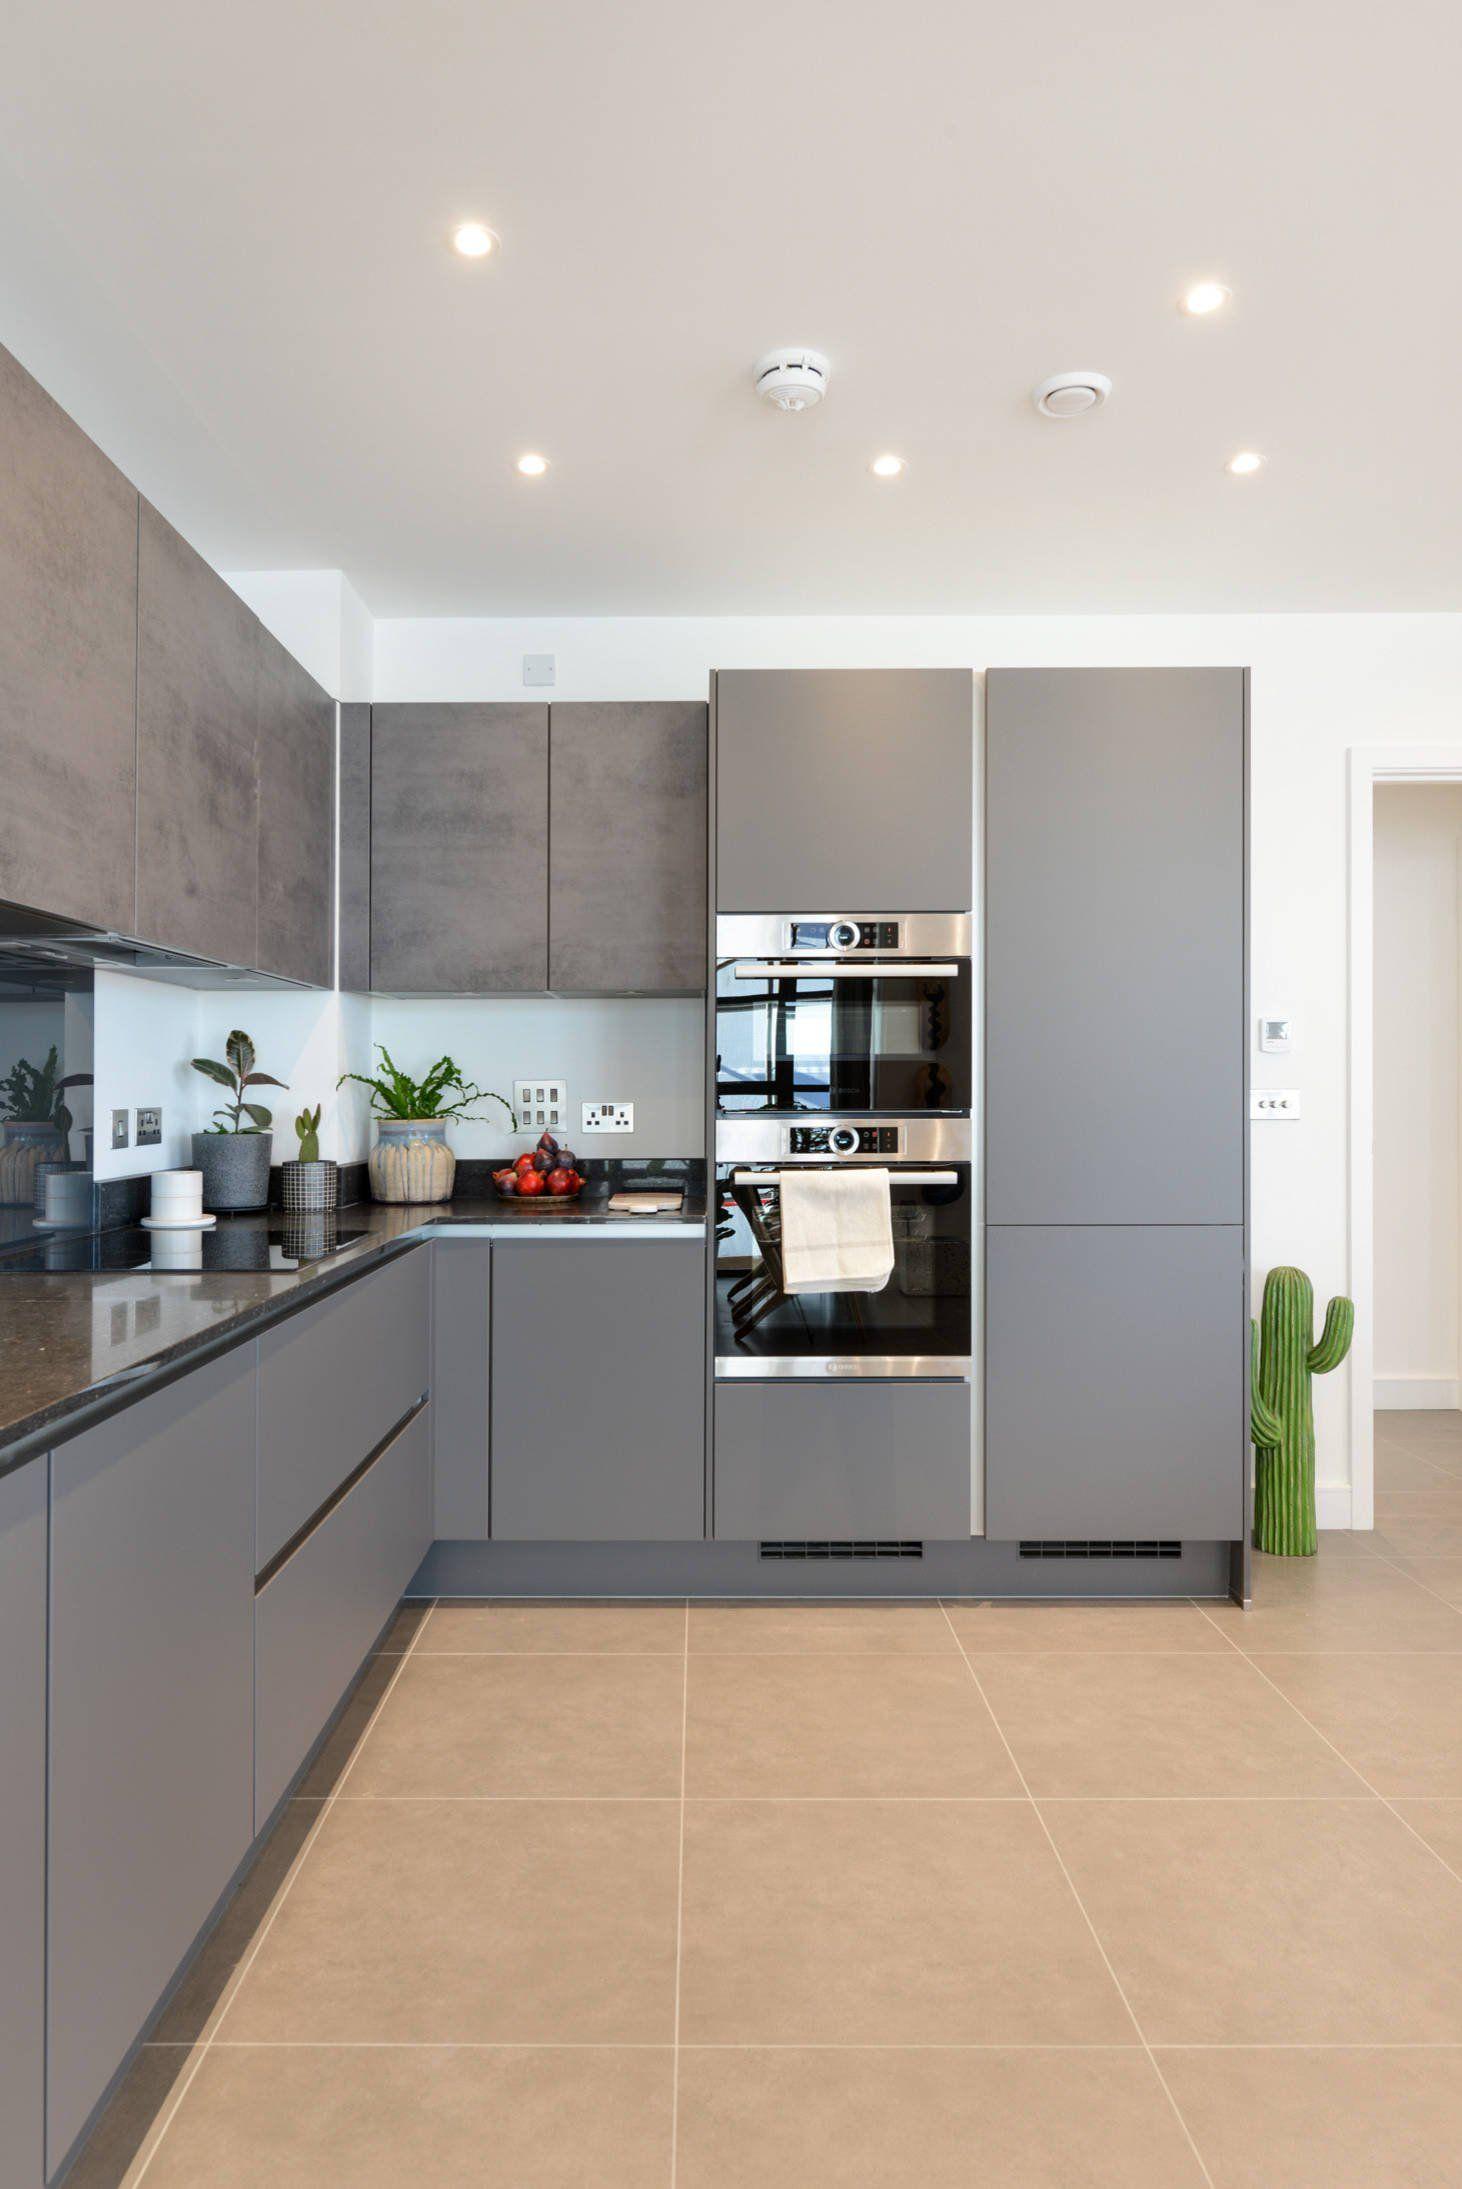 Full Size of Küche Blende Grau Sockelblende Küche Demontieren Küche Blende Geschirrspüler Entfernen Küche Mit Blende Küche Küche Blende